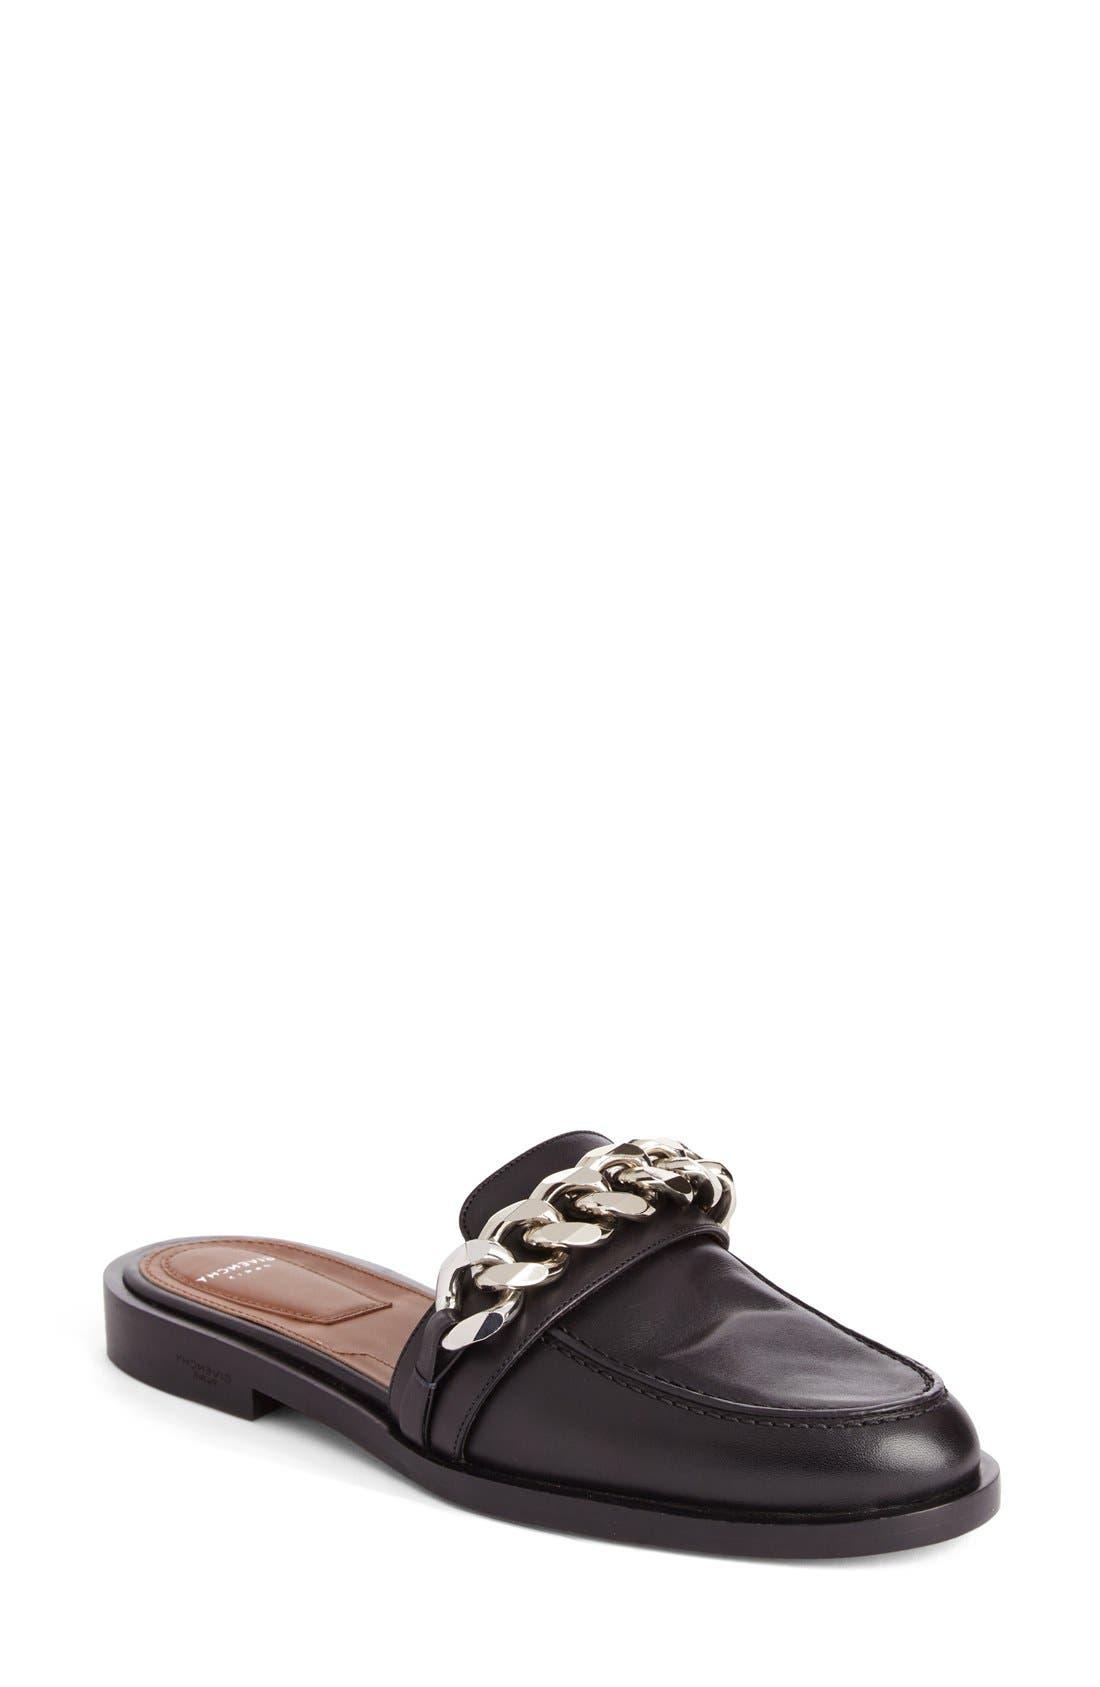 Chain Strap Loafer Mule,                         Main,                         color, Black